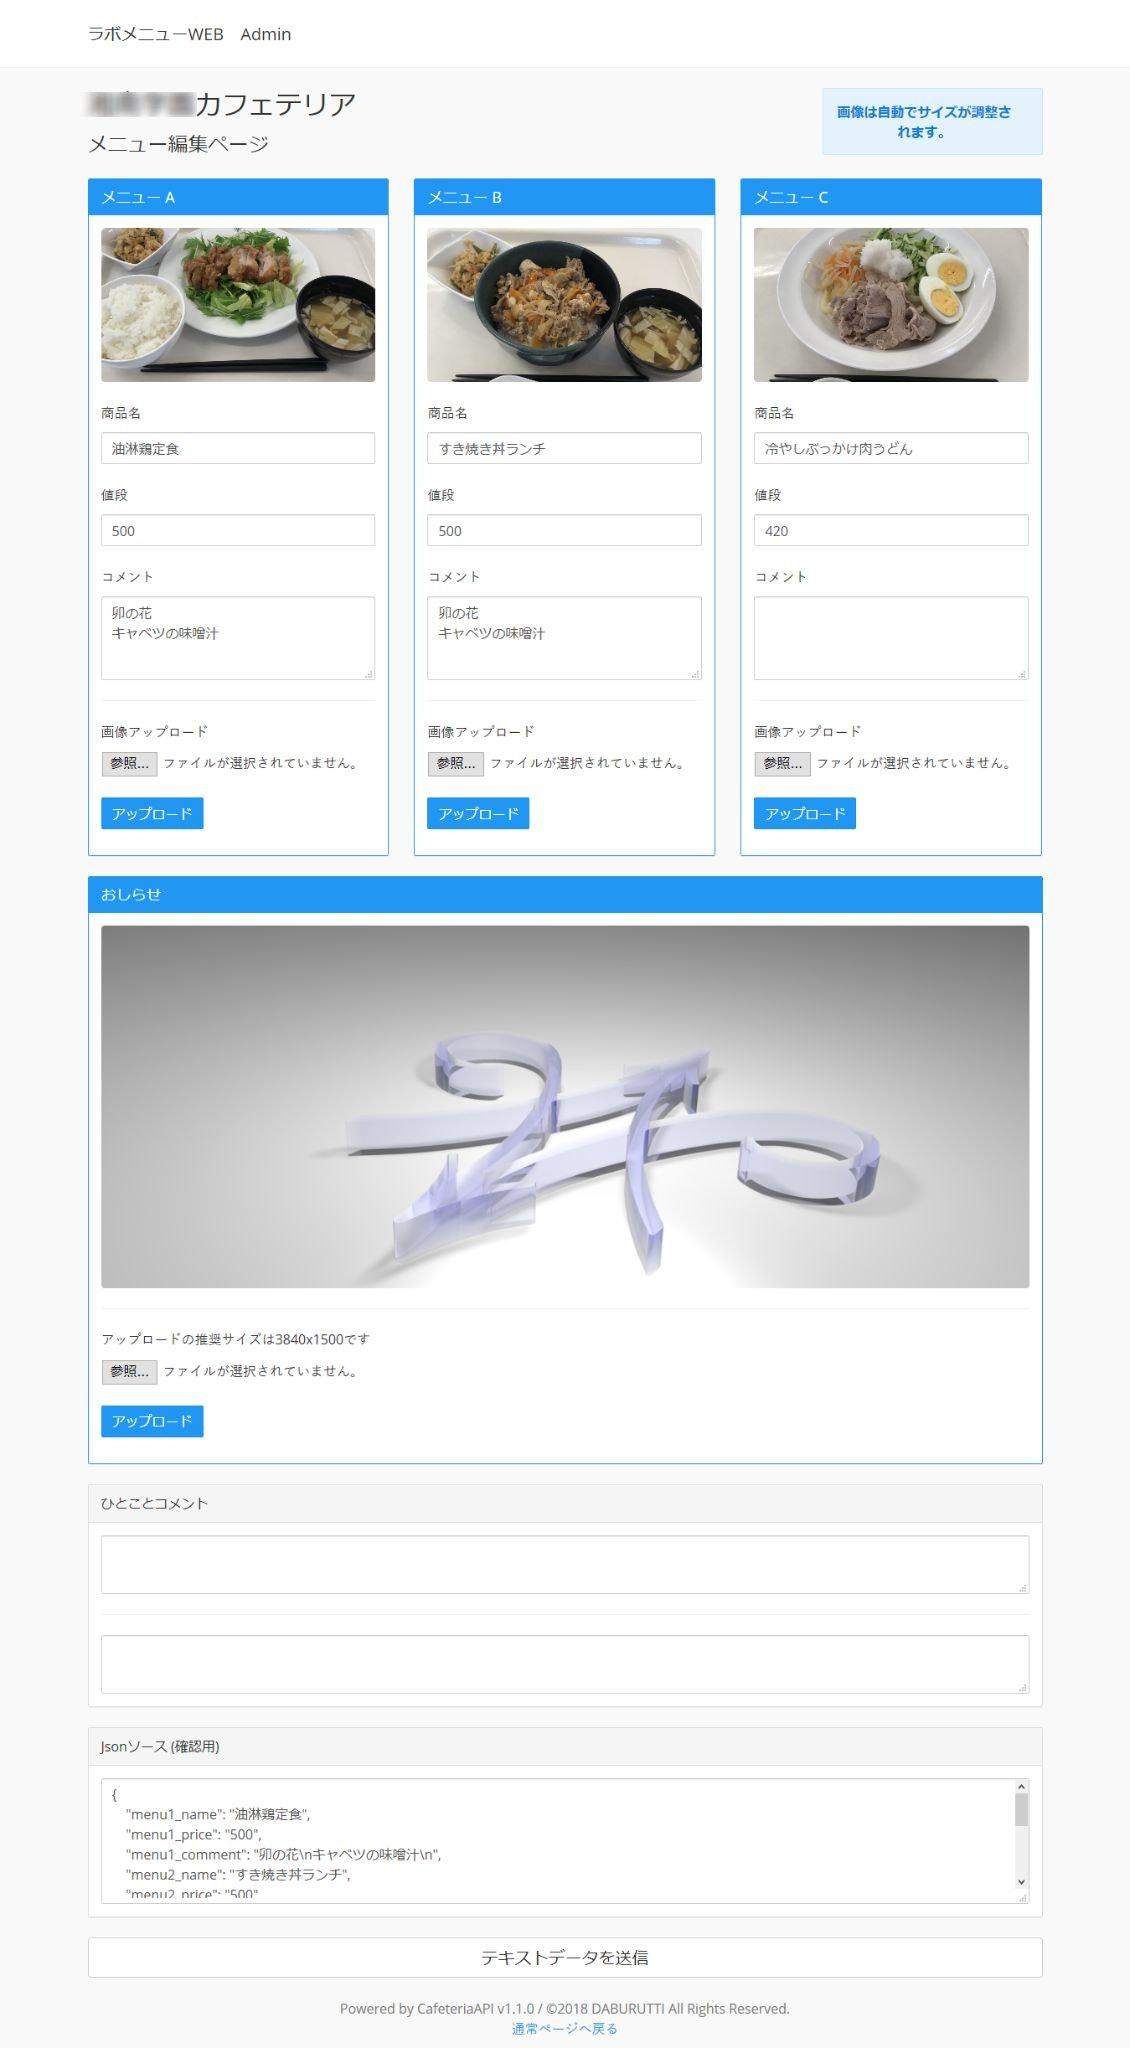 Screenshot-2018-7-5 ラボメニューWEB Admin_censored.jpg